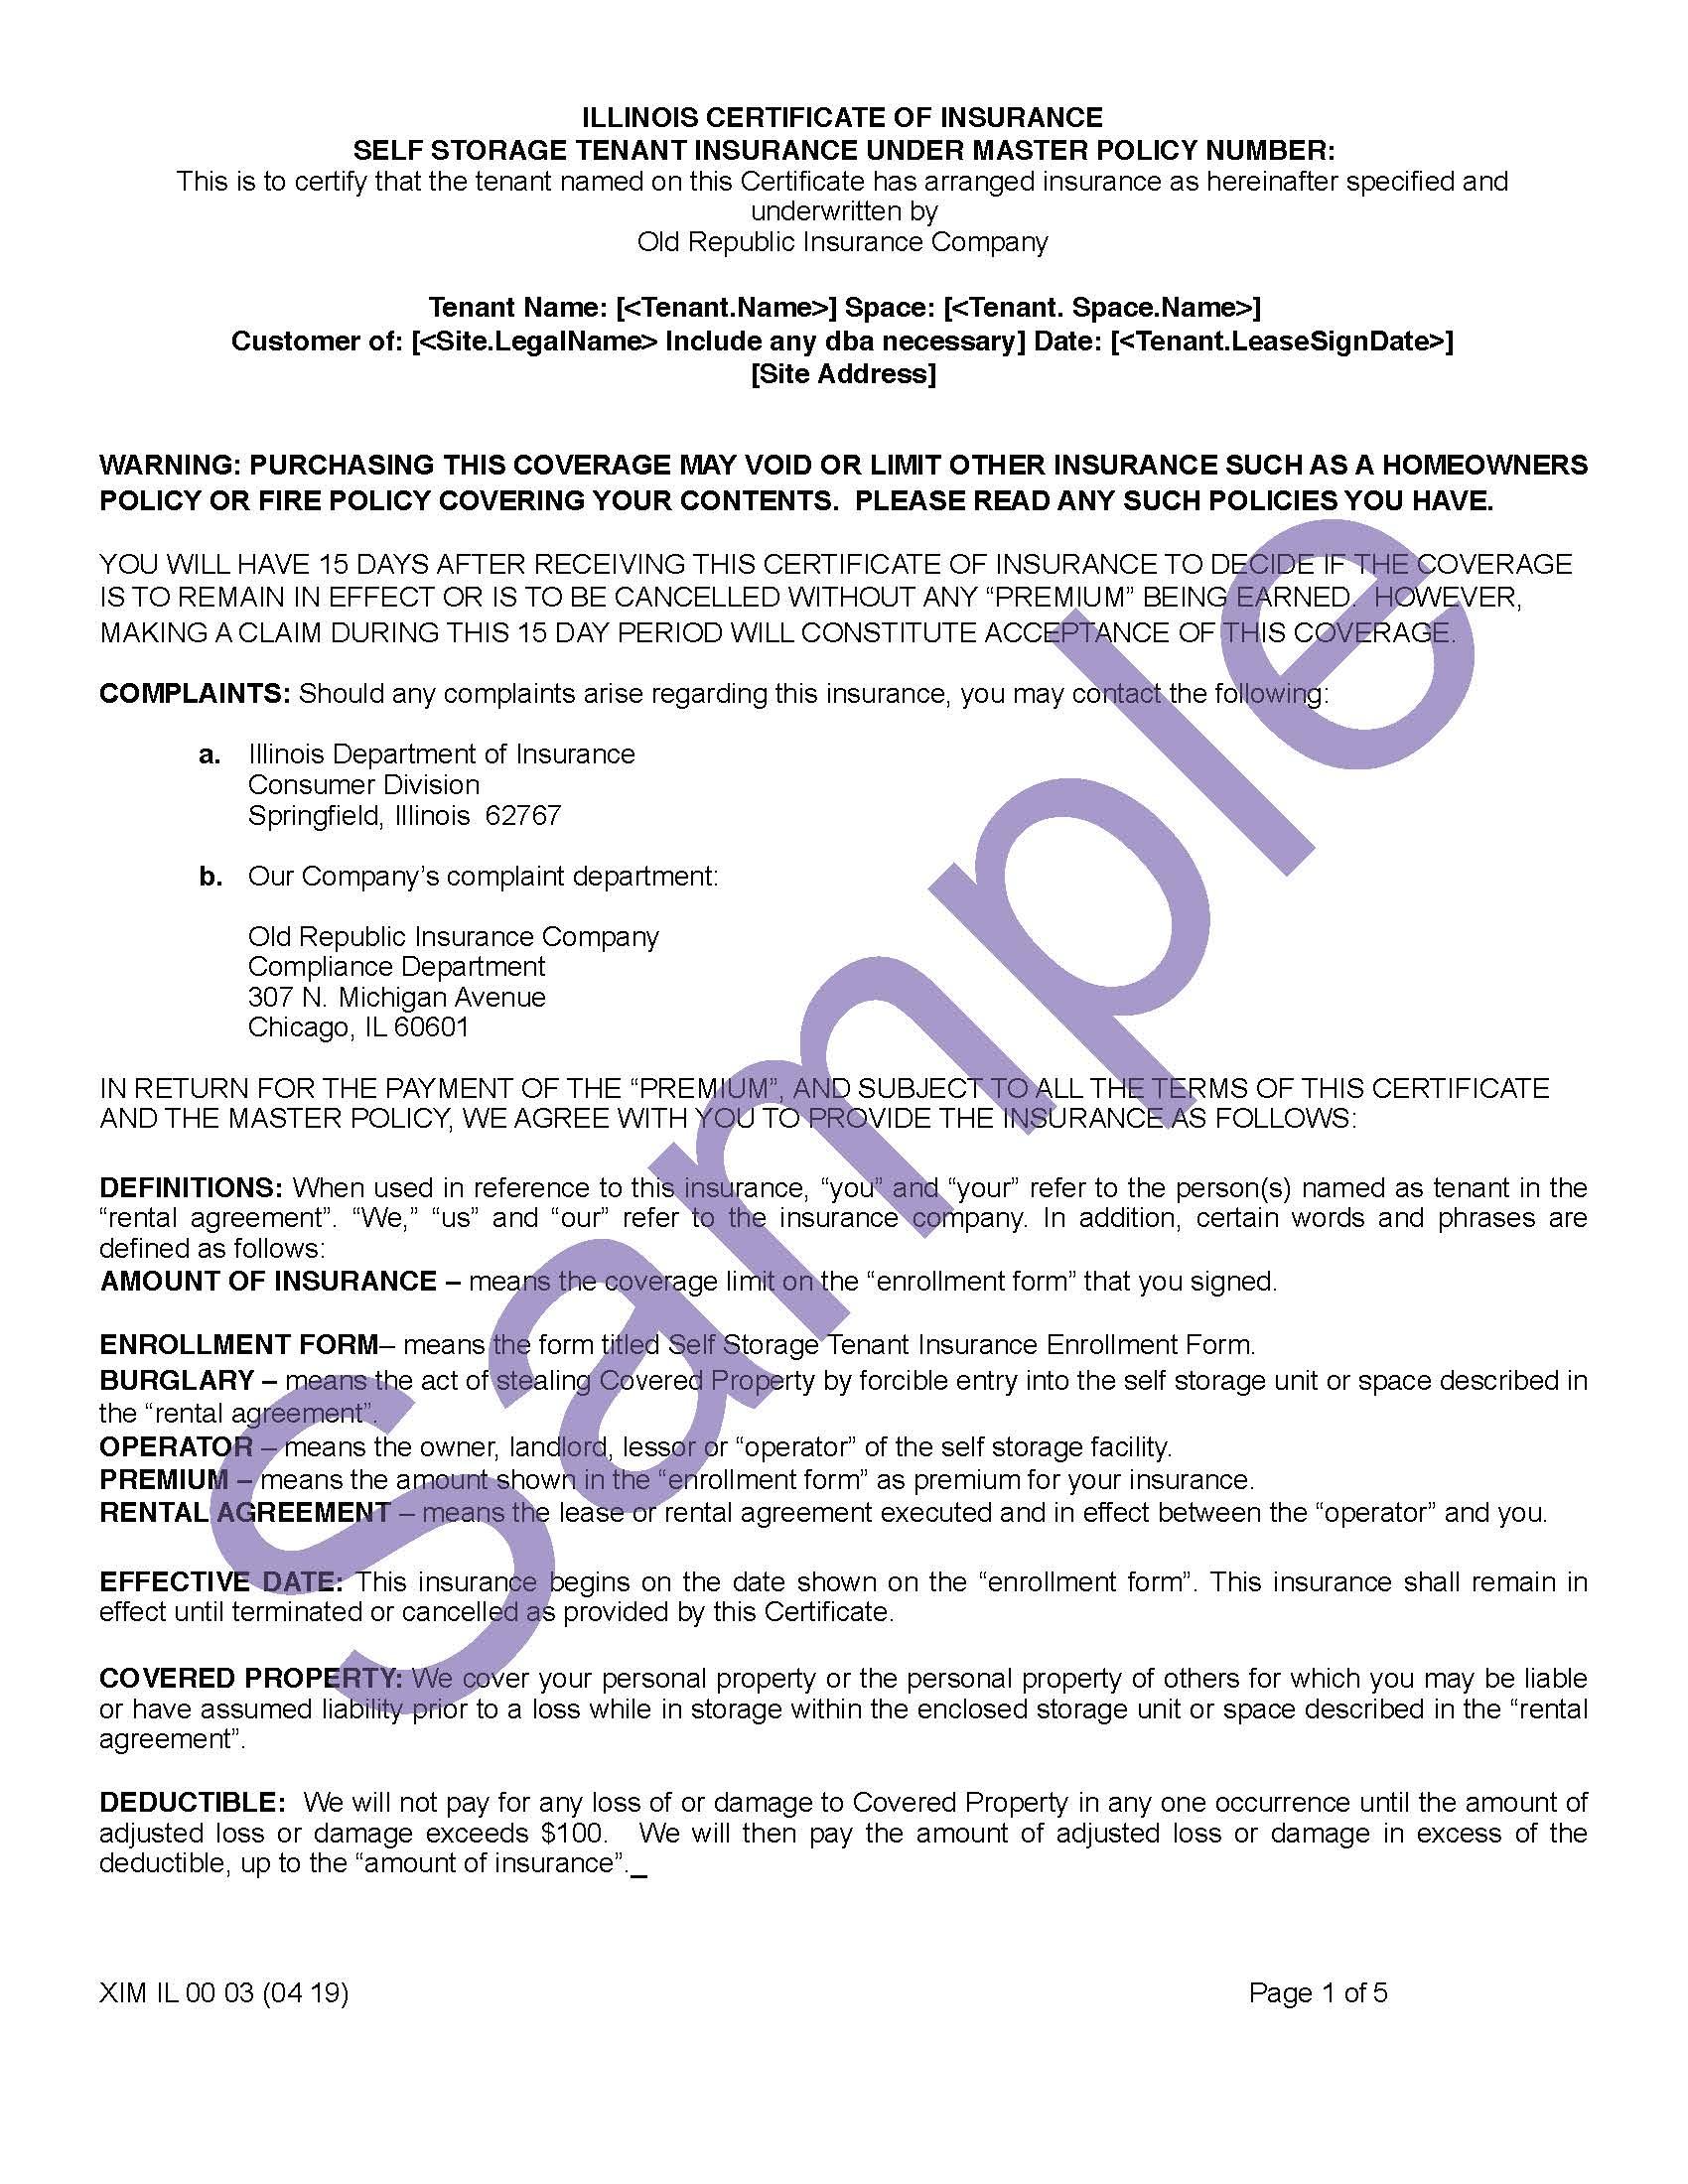 XIM IL 00 03 04 19 Illinois Certificate of InsuranceSample_Page_1.jpg